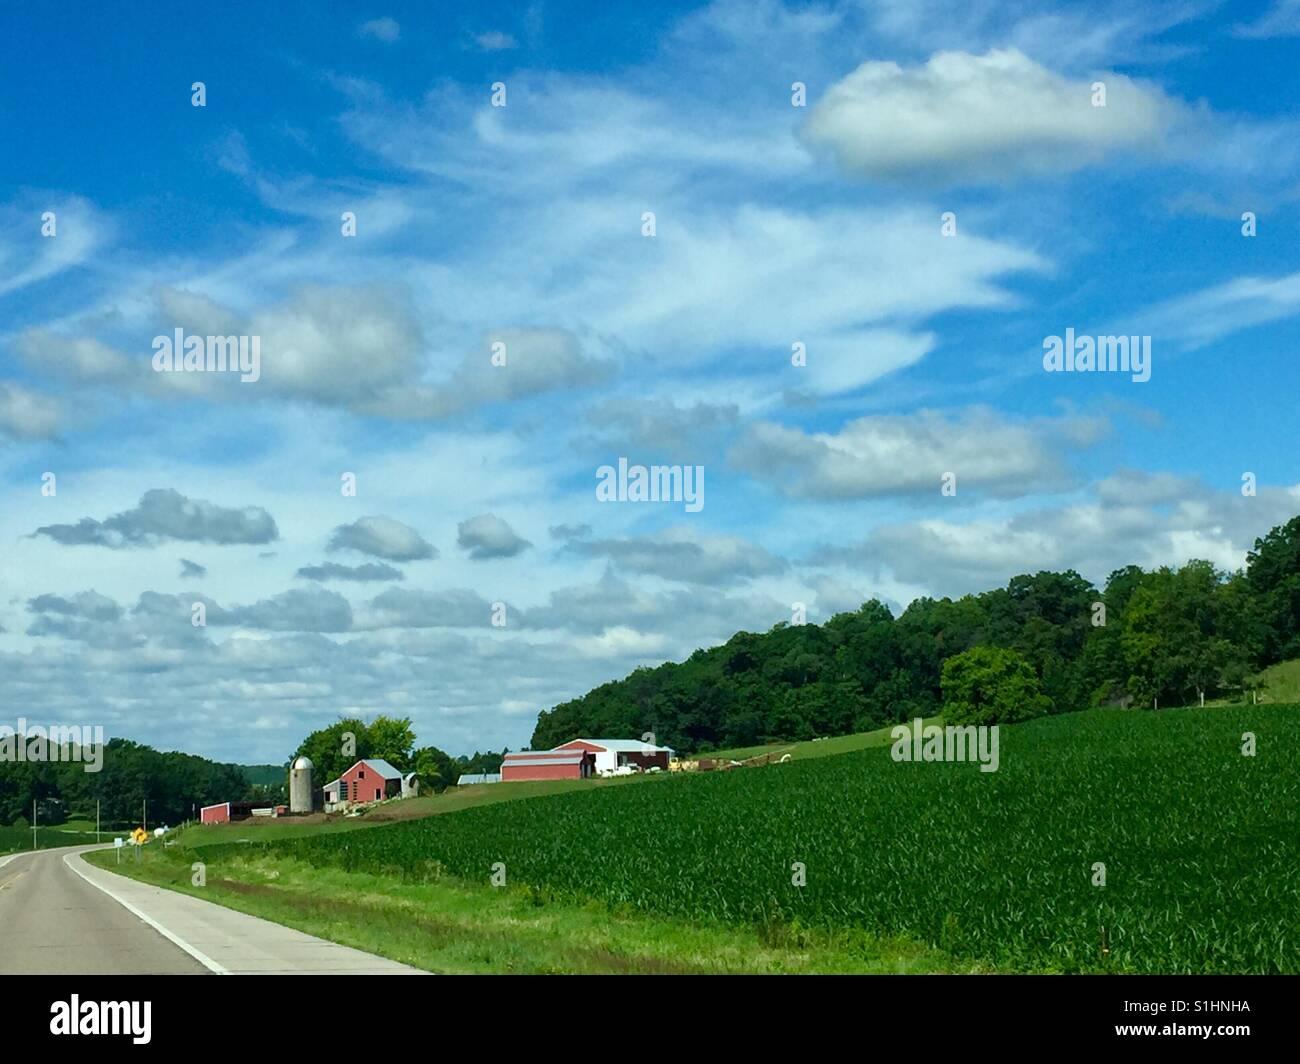 Minnesota Farm - Stock Image